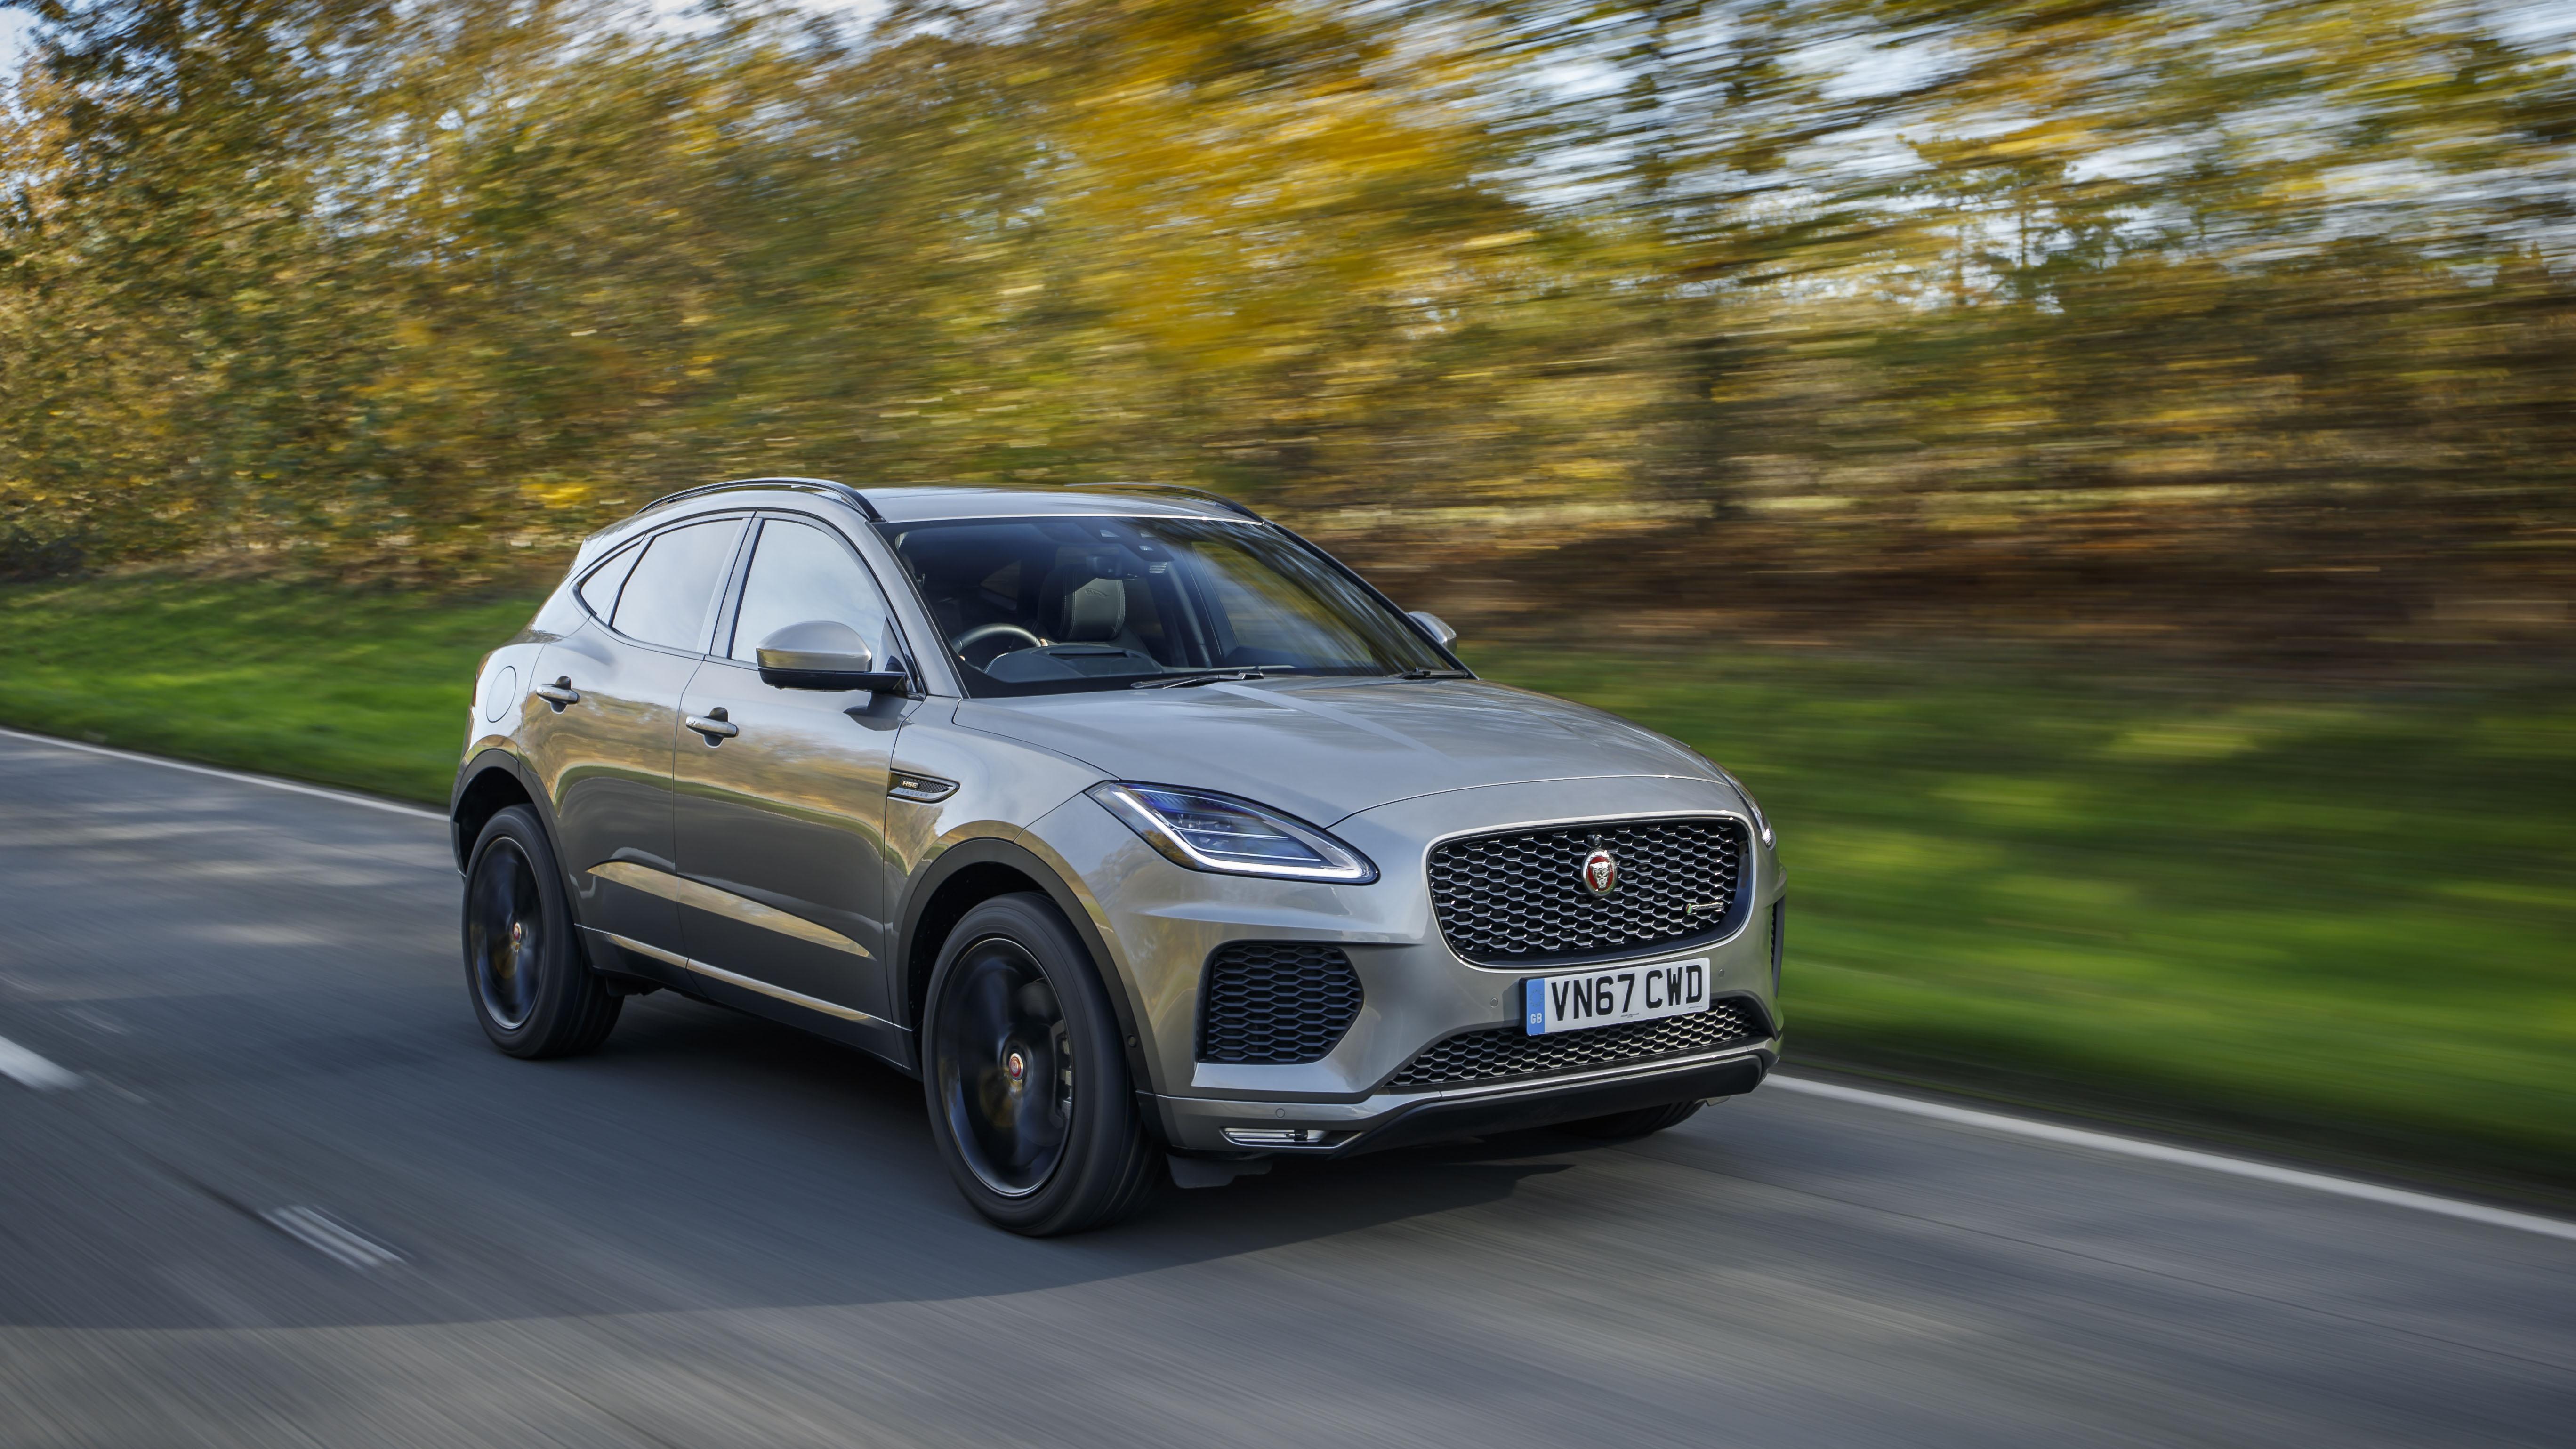 s jaguar price car top speed xfr cars list